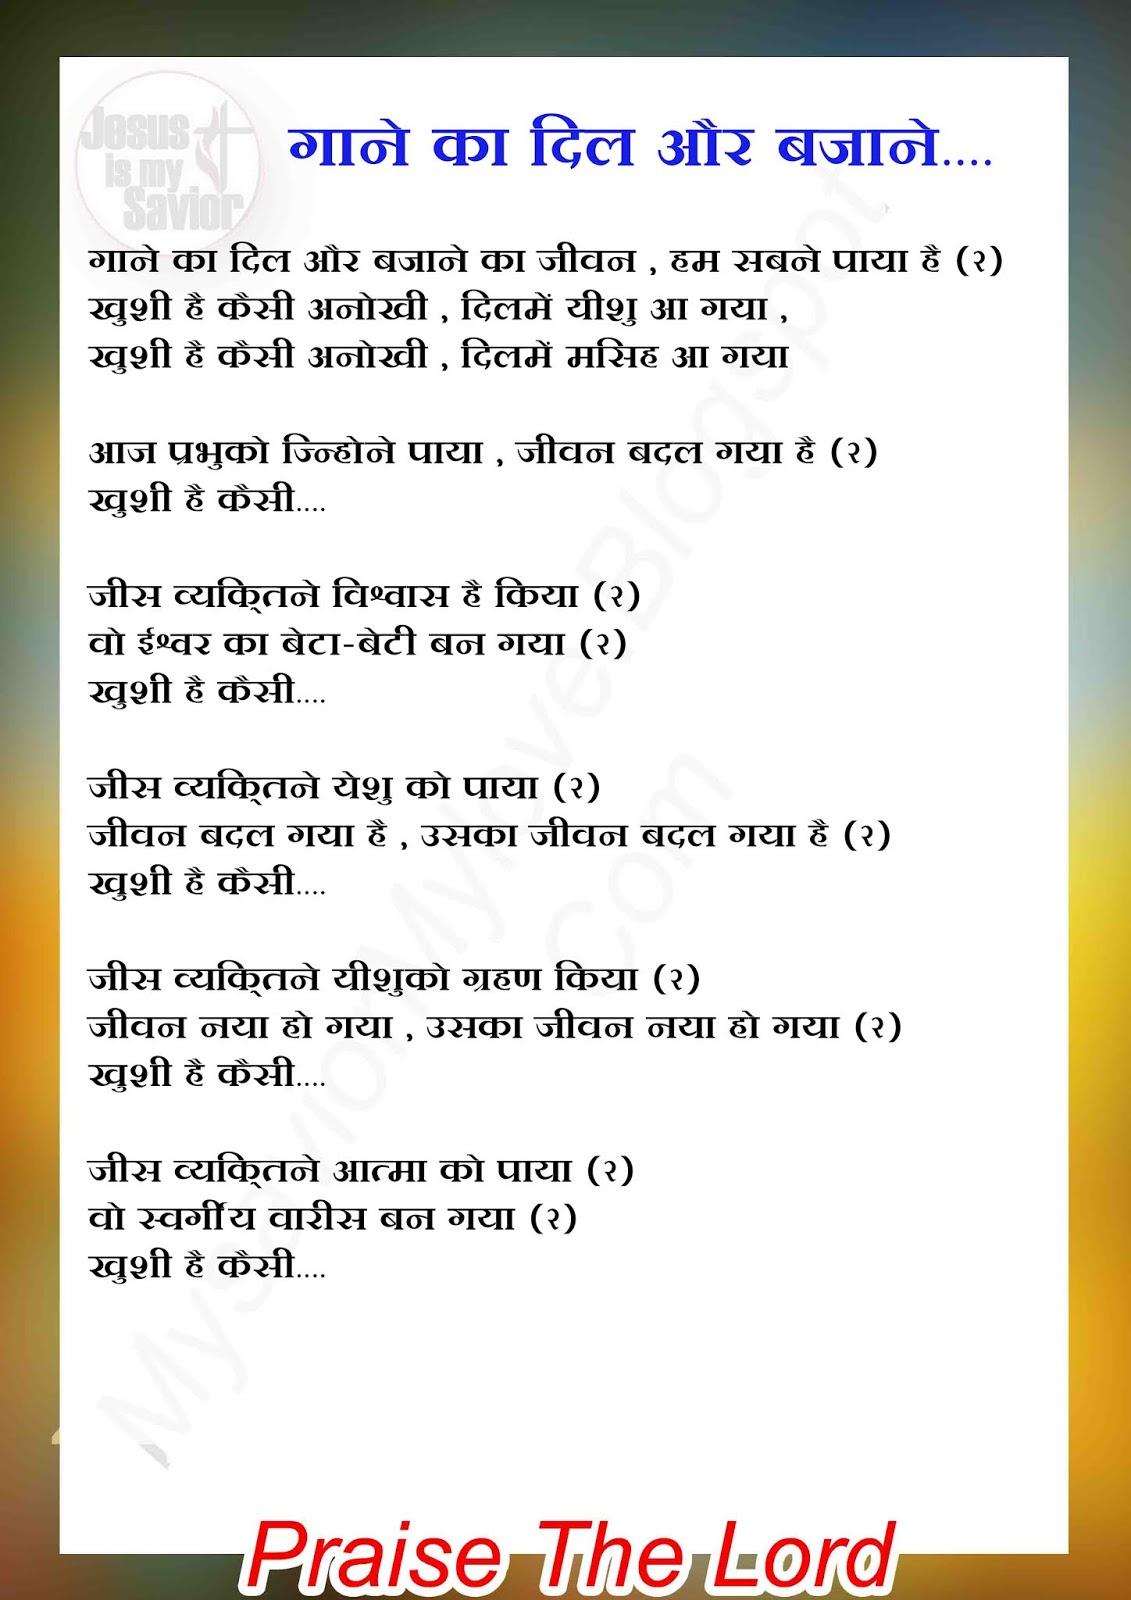 Gane Ka Dil Or Bajane Ka Jivan Jesus Hindi Song New Christian Song S Lyrics Surya shaam sharan aaye, safal kije seva surya shaam sharan aaye, safal kije seva. gane ka dil or bajane ka jivan jesus